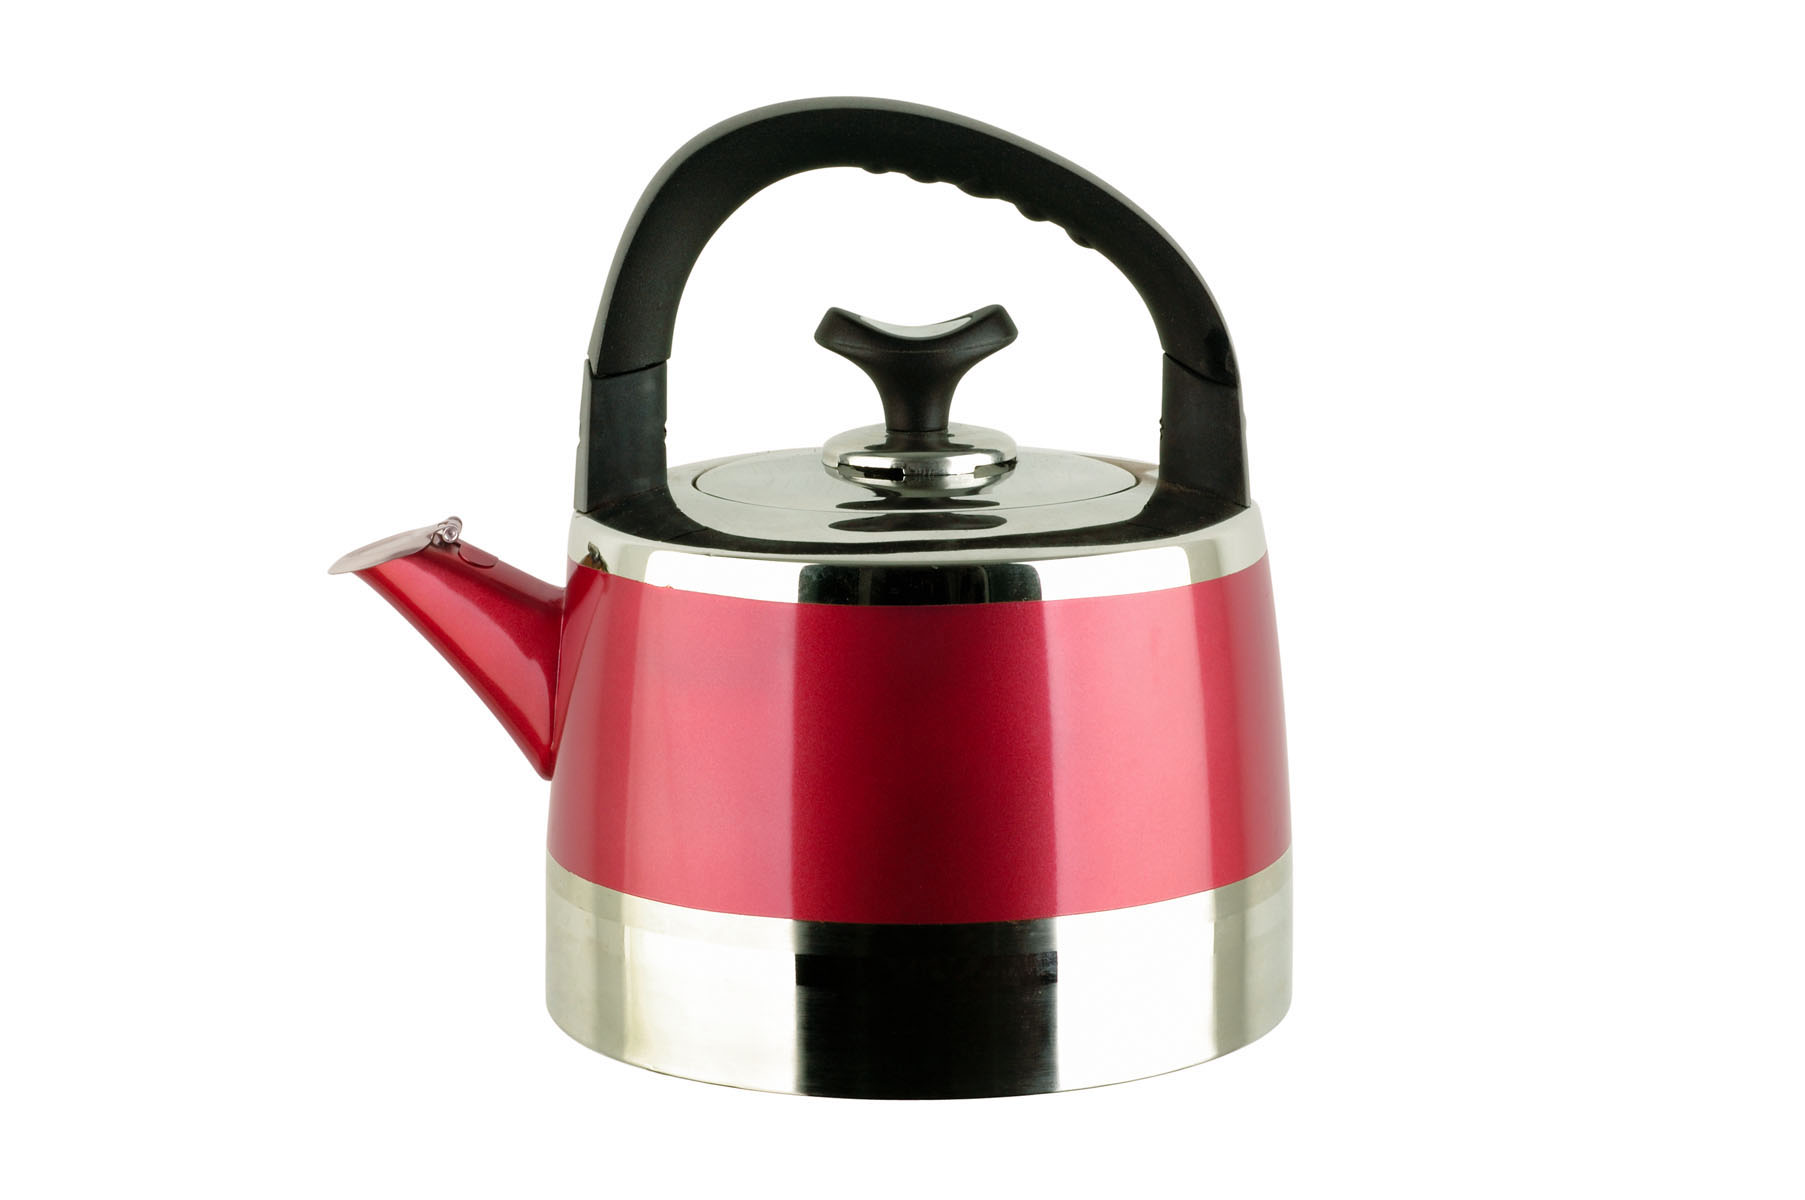 Чайник Bekker Koch со свистком, цвет: красный, 3 л. BK-S447 термос bekker koch с помпой 2 5 л bk 4033